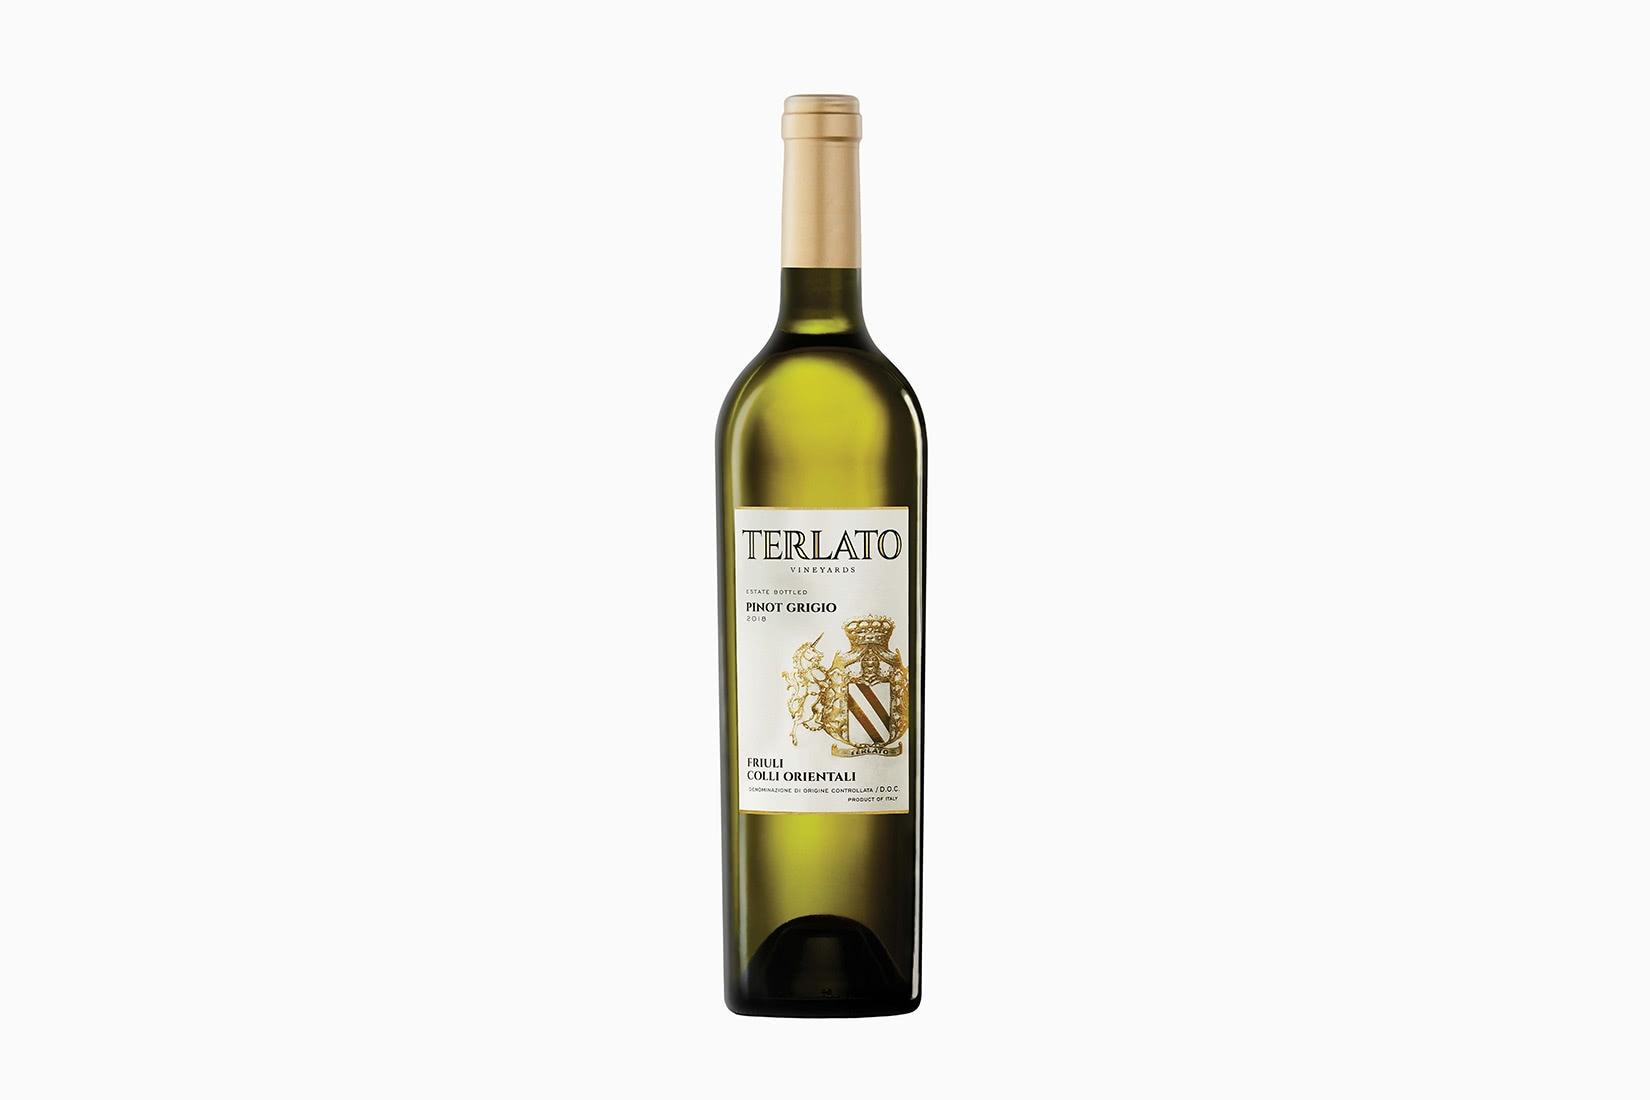 best wine terlato family vineyards friuli pinot grigio - Luxe Digital